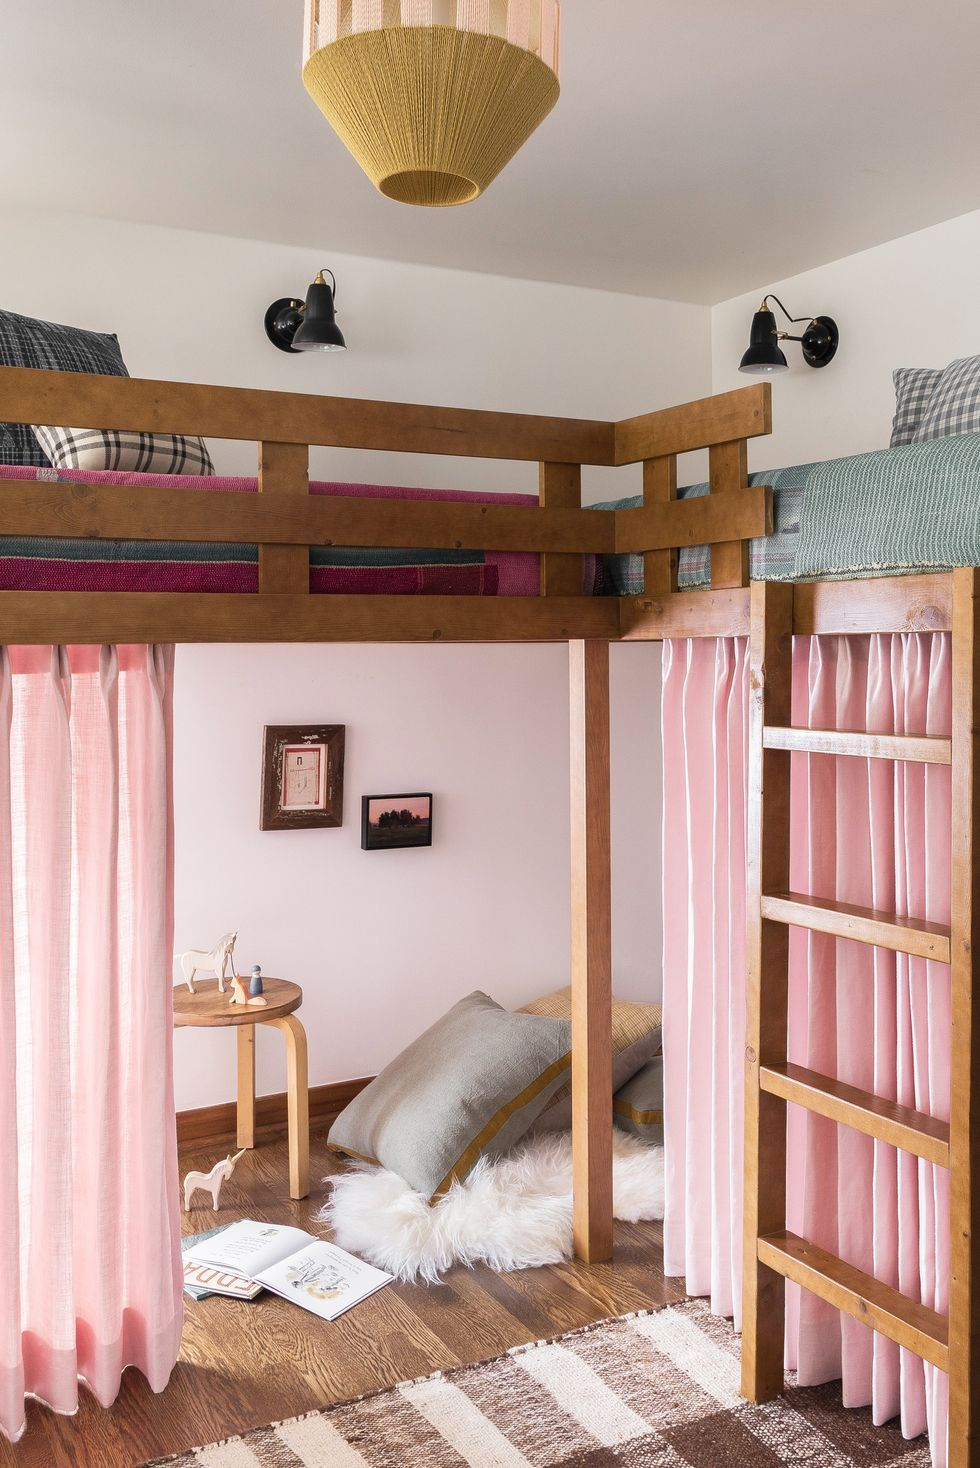 pix Bedroom Toy Storage Ideas toy storage ideas for your kid s room